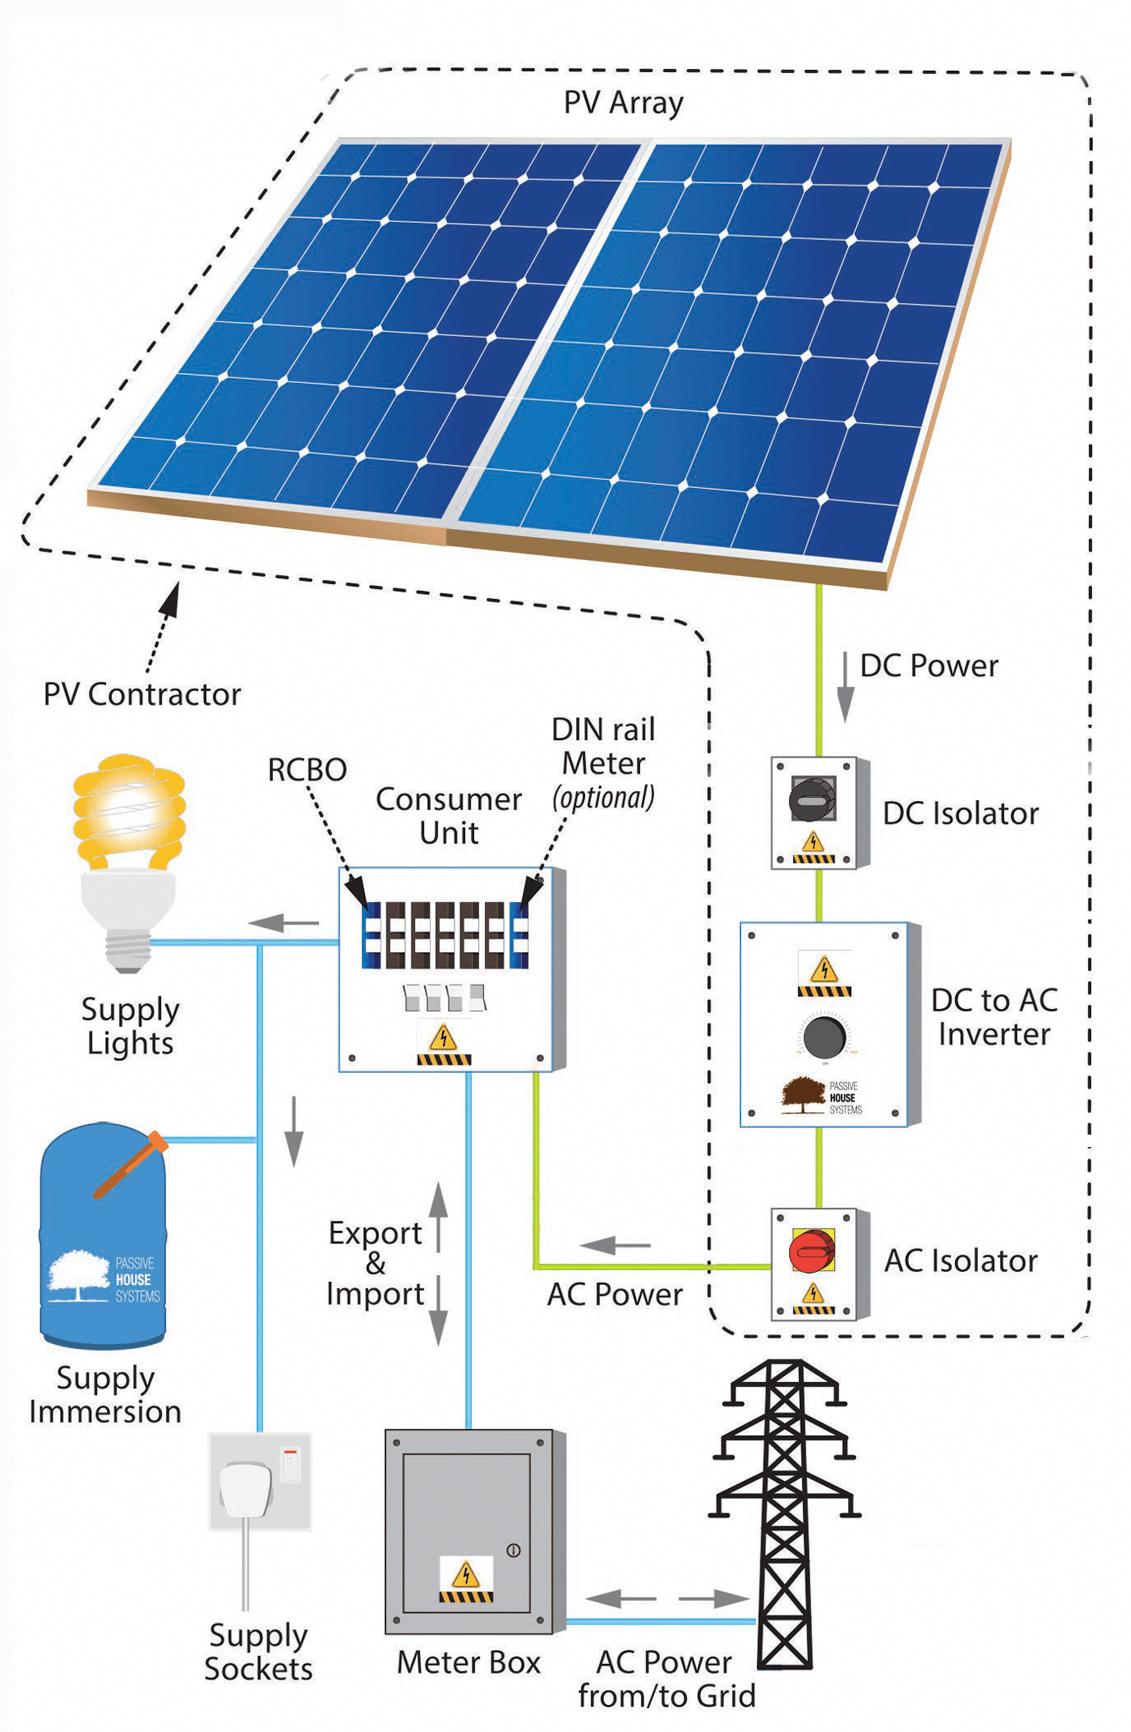 Solar Pv Schematic New Solarenergy Solarpanels Solarpower Solarpanelsforhome Solarpanelkits Solarpoweredgenerator Solar Pv Systems Solar Panels Solar Pv Panel